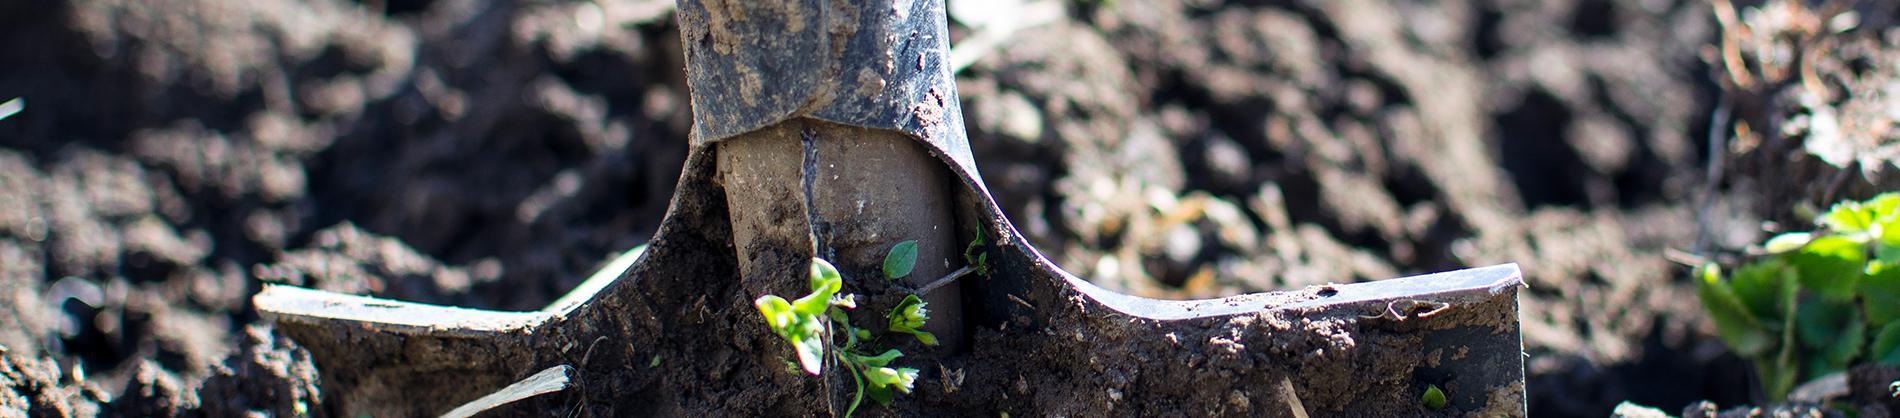 Spade digging up soil